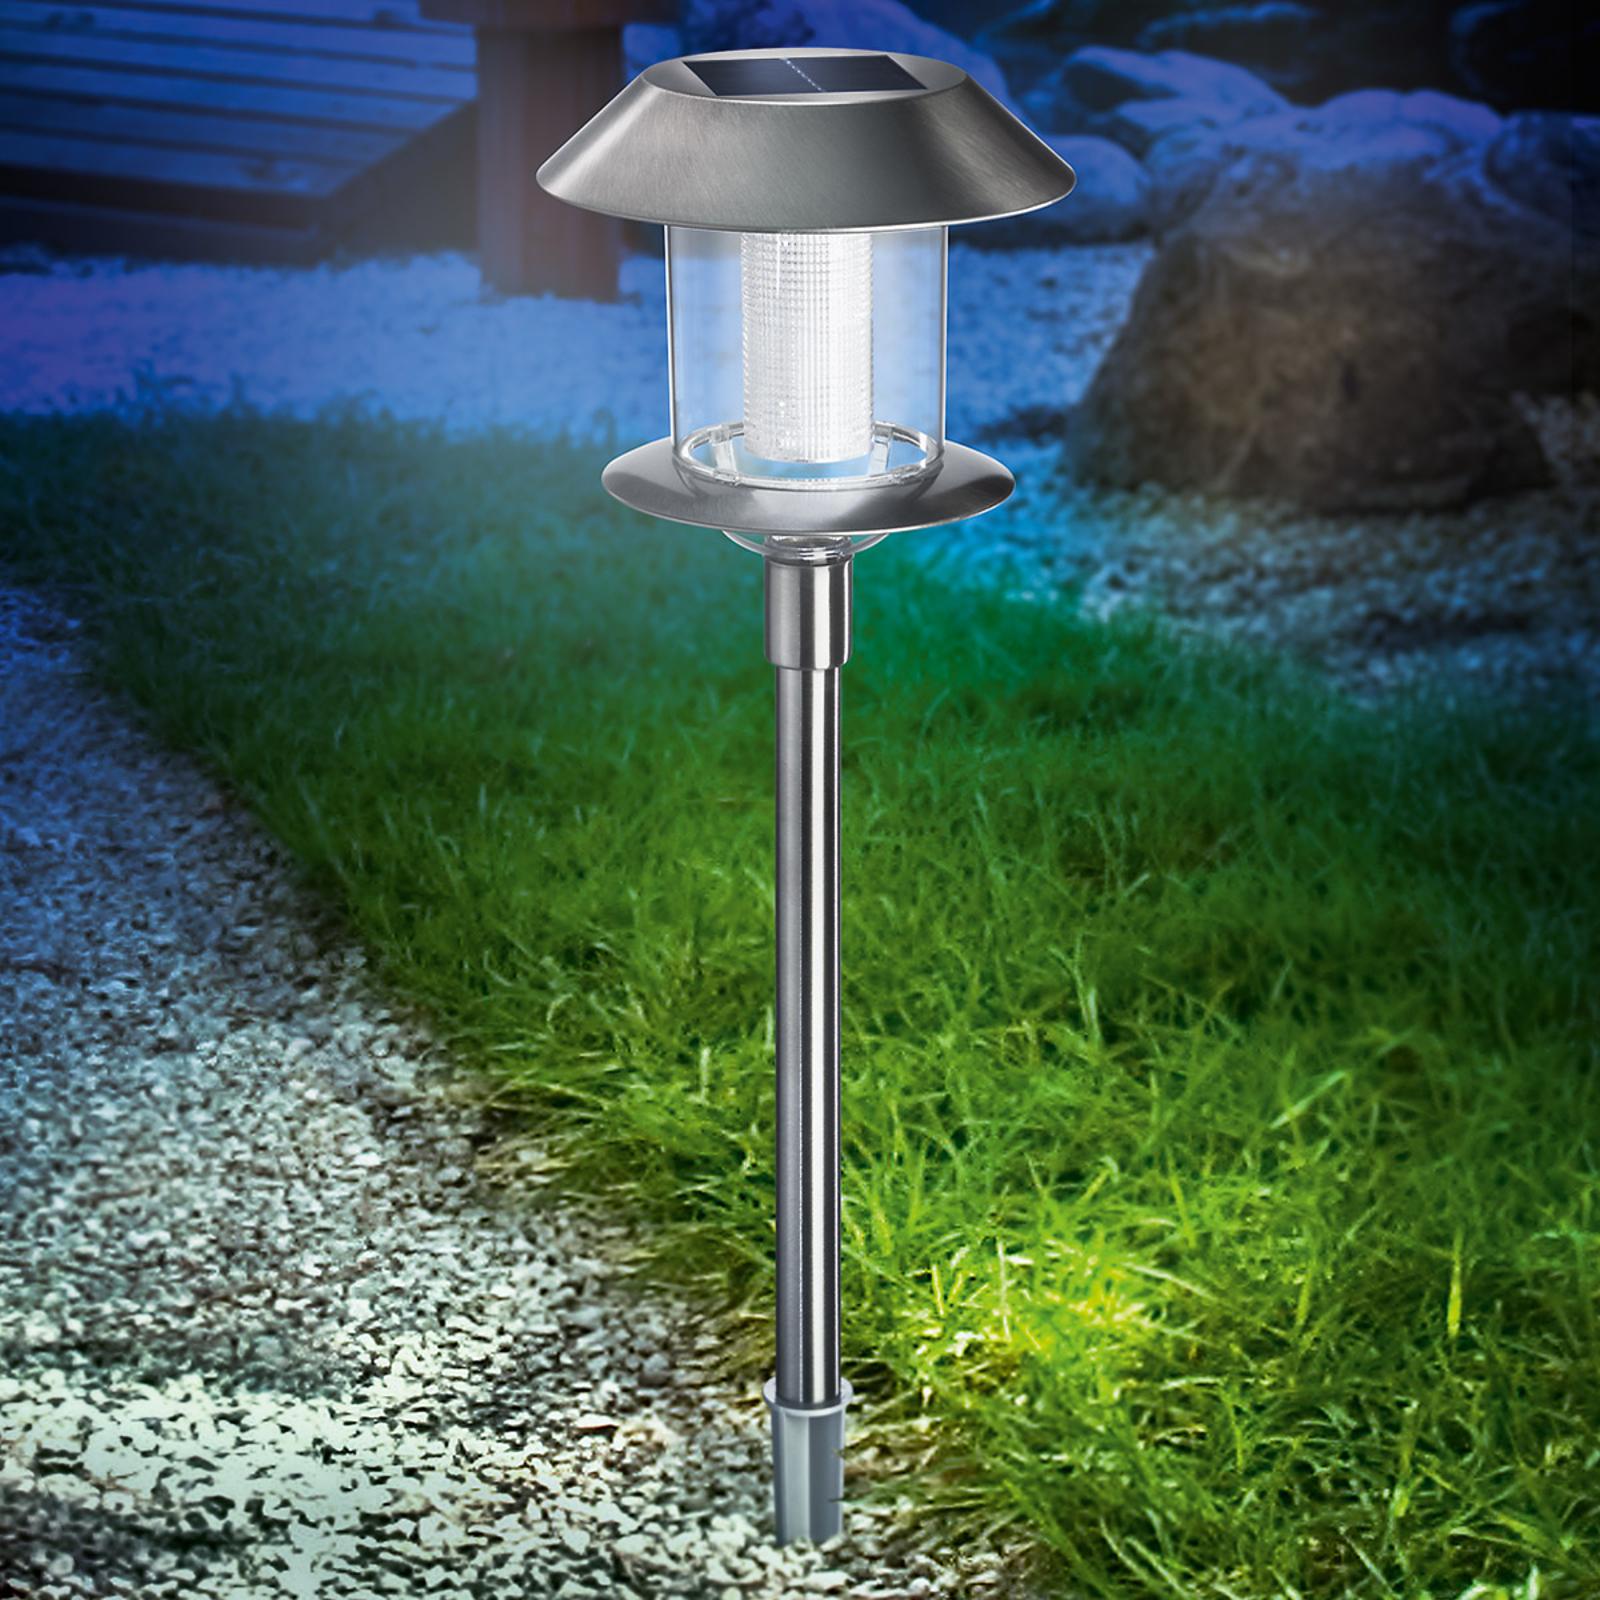 Swing Duo Solar - stainless steel solar light _3012004_1